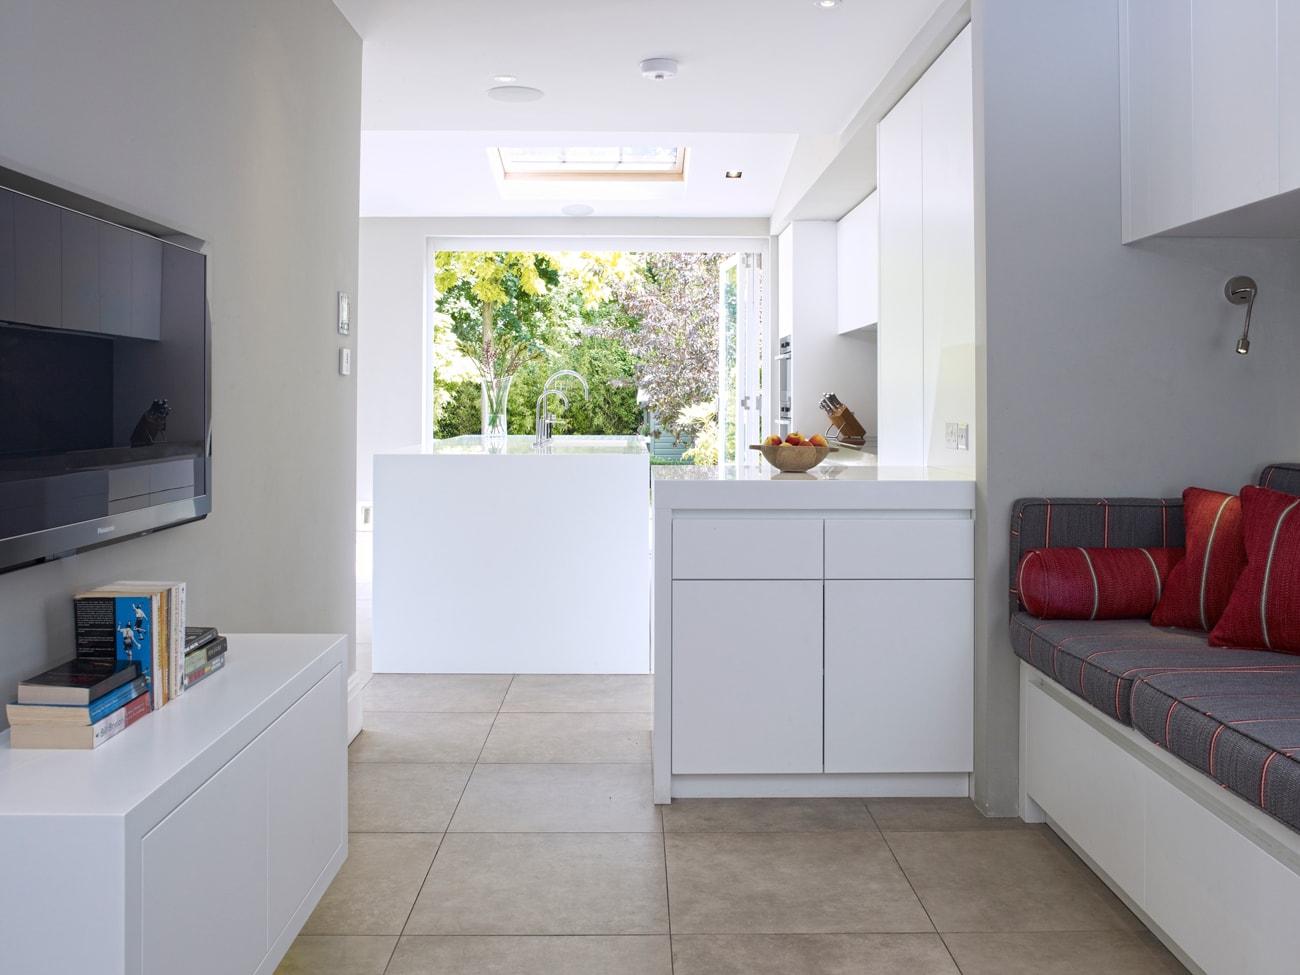 Esmund small lounge concept leading into kitchen